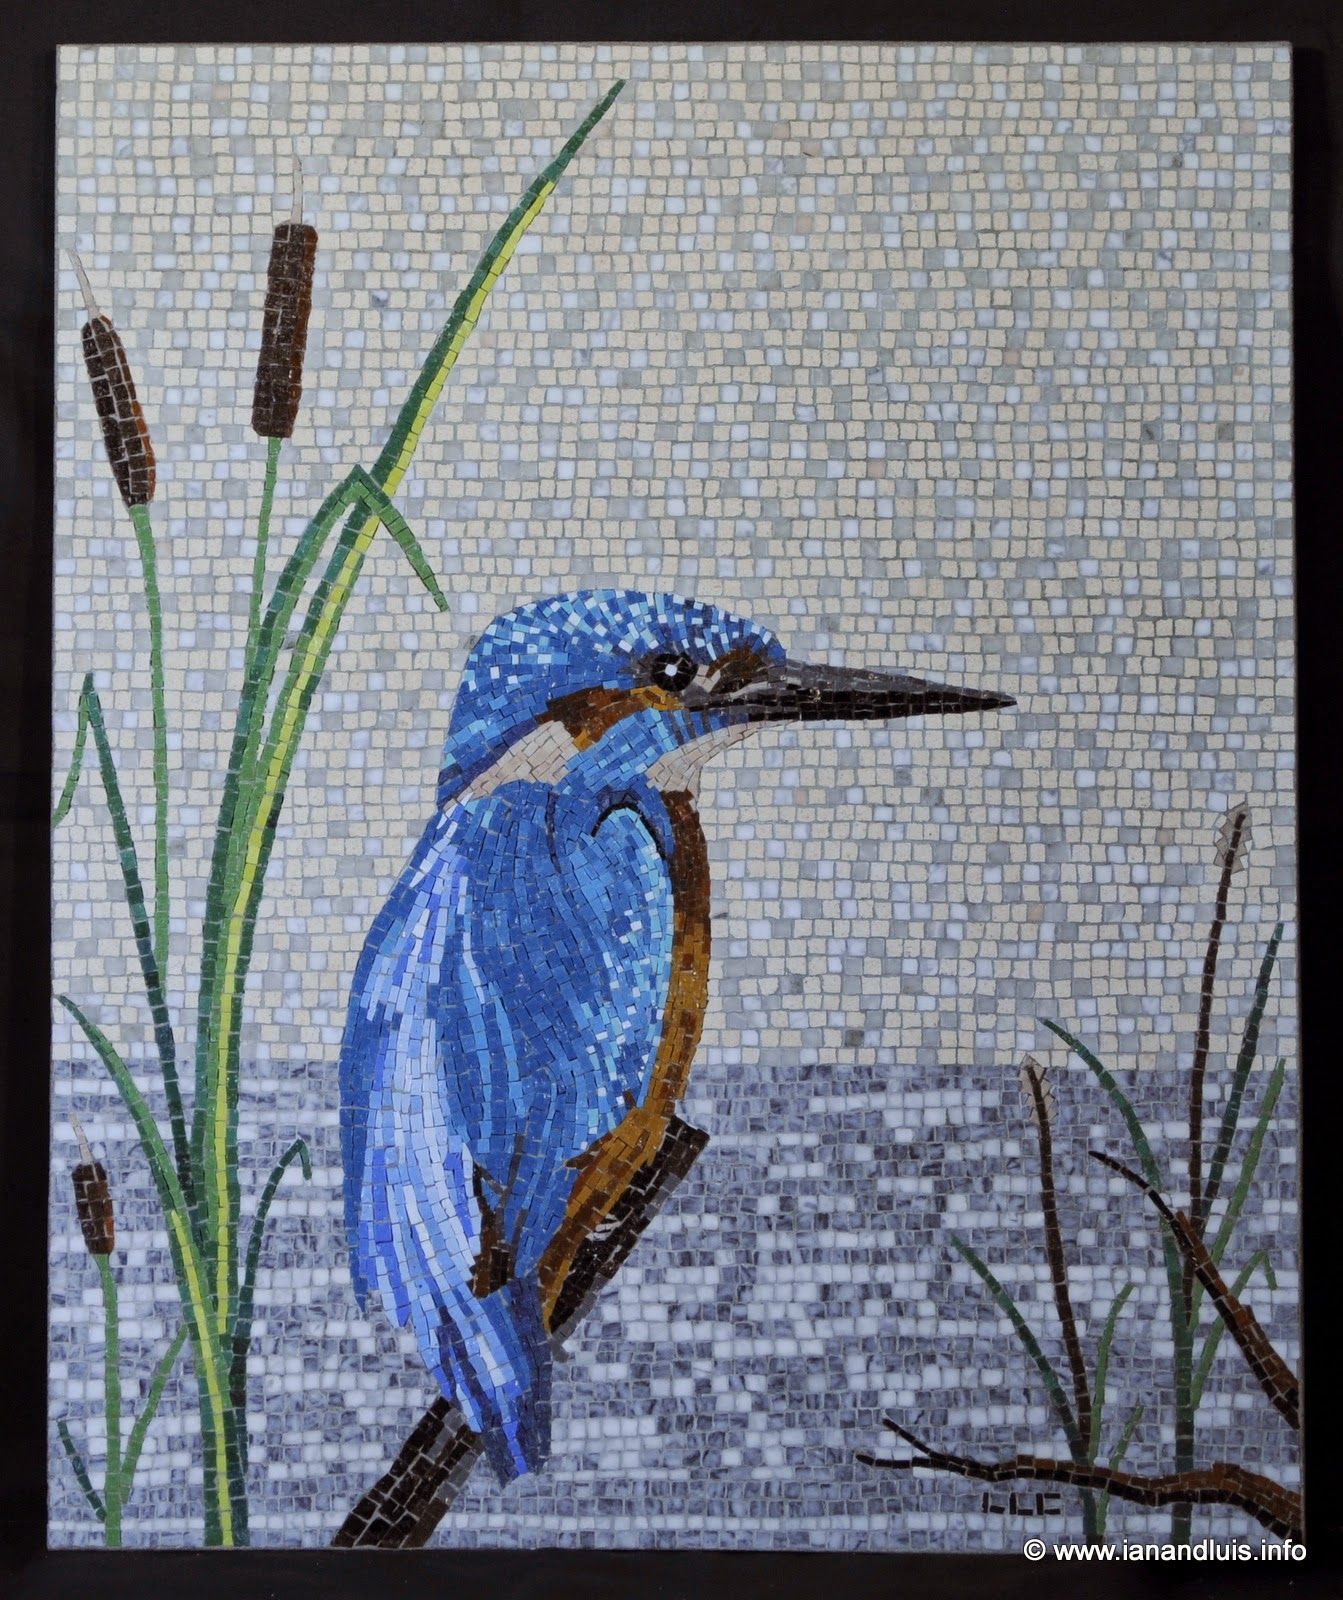 seagull artist mosaic element